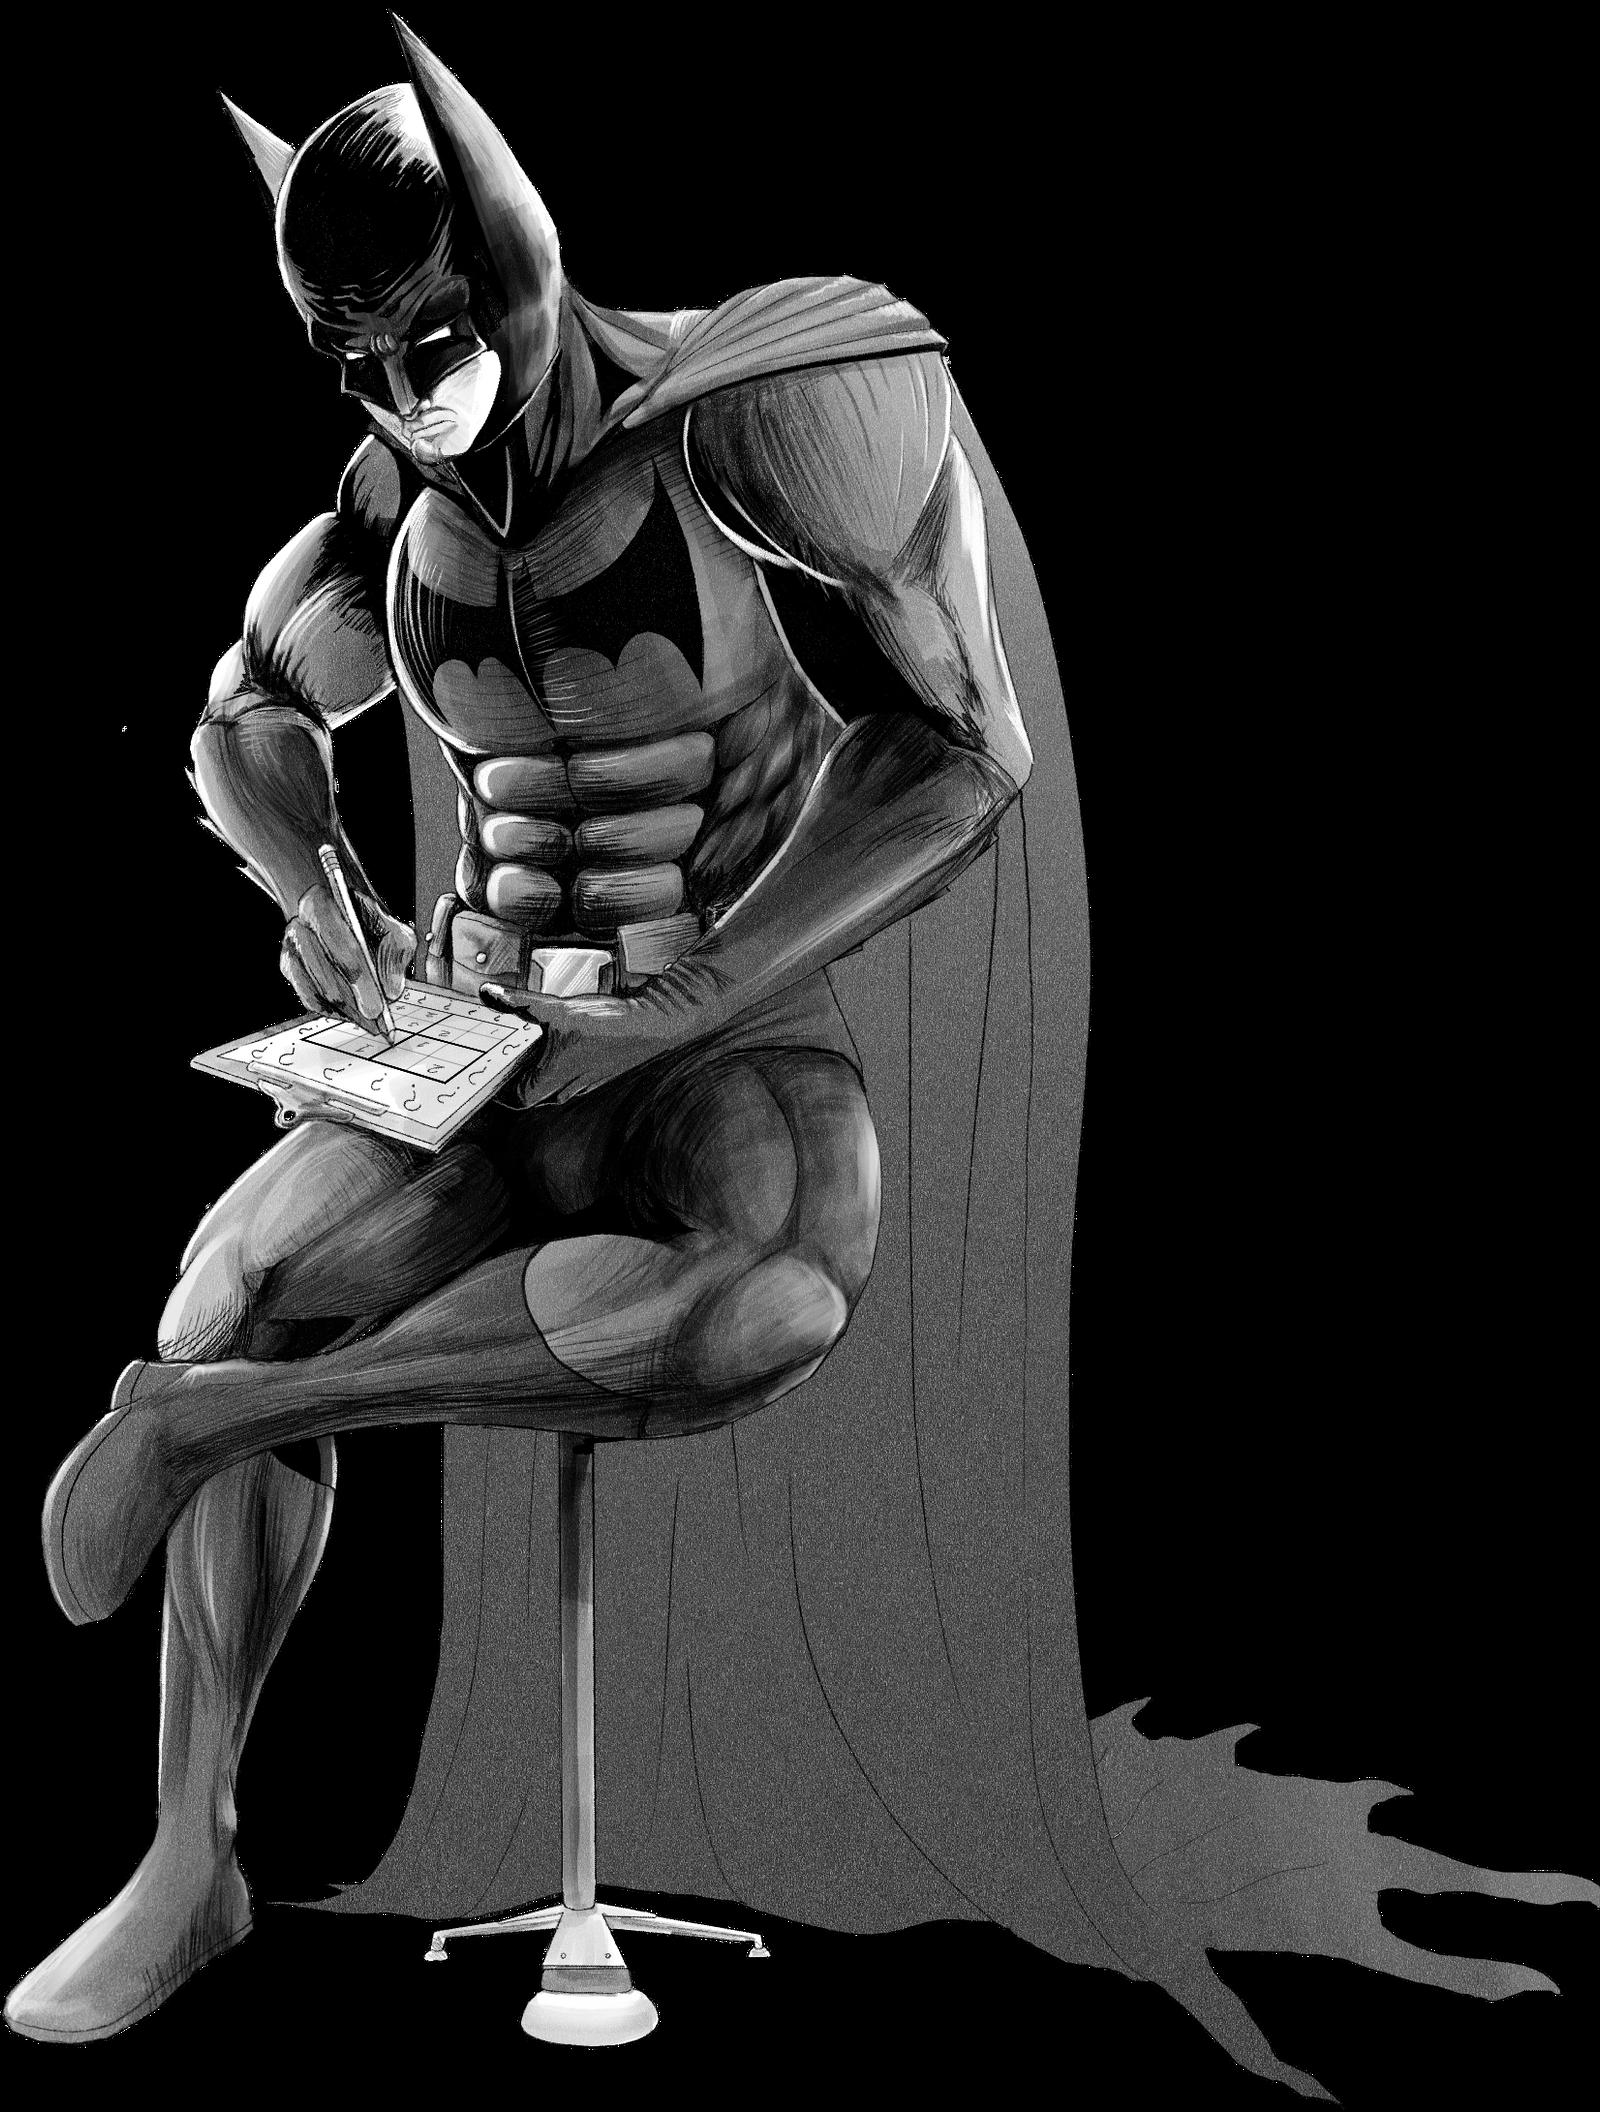 Batman Practicing His Detective Skills No Bg By Uzersname On Deviantart